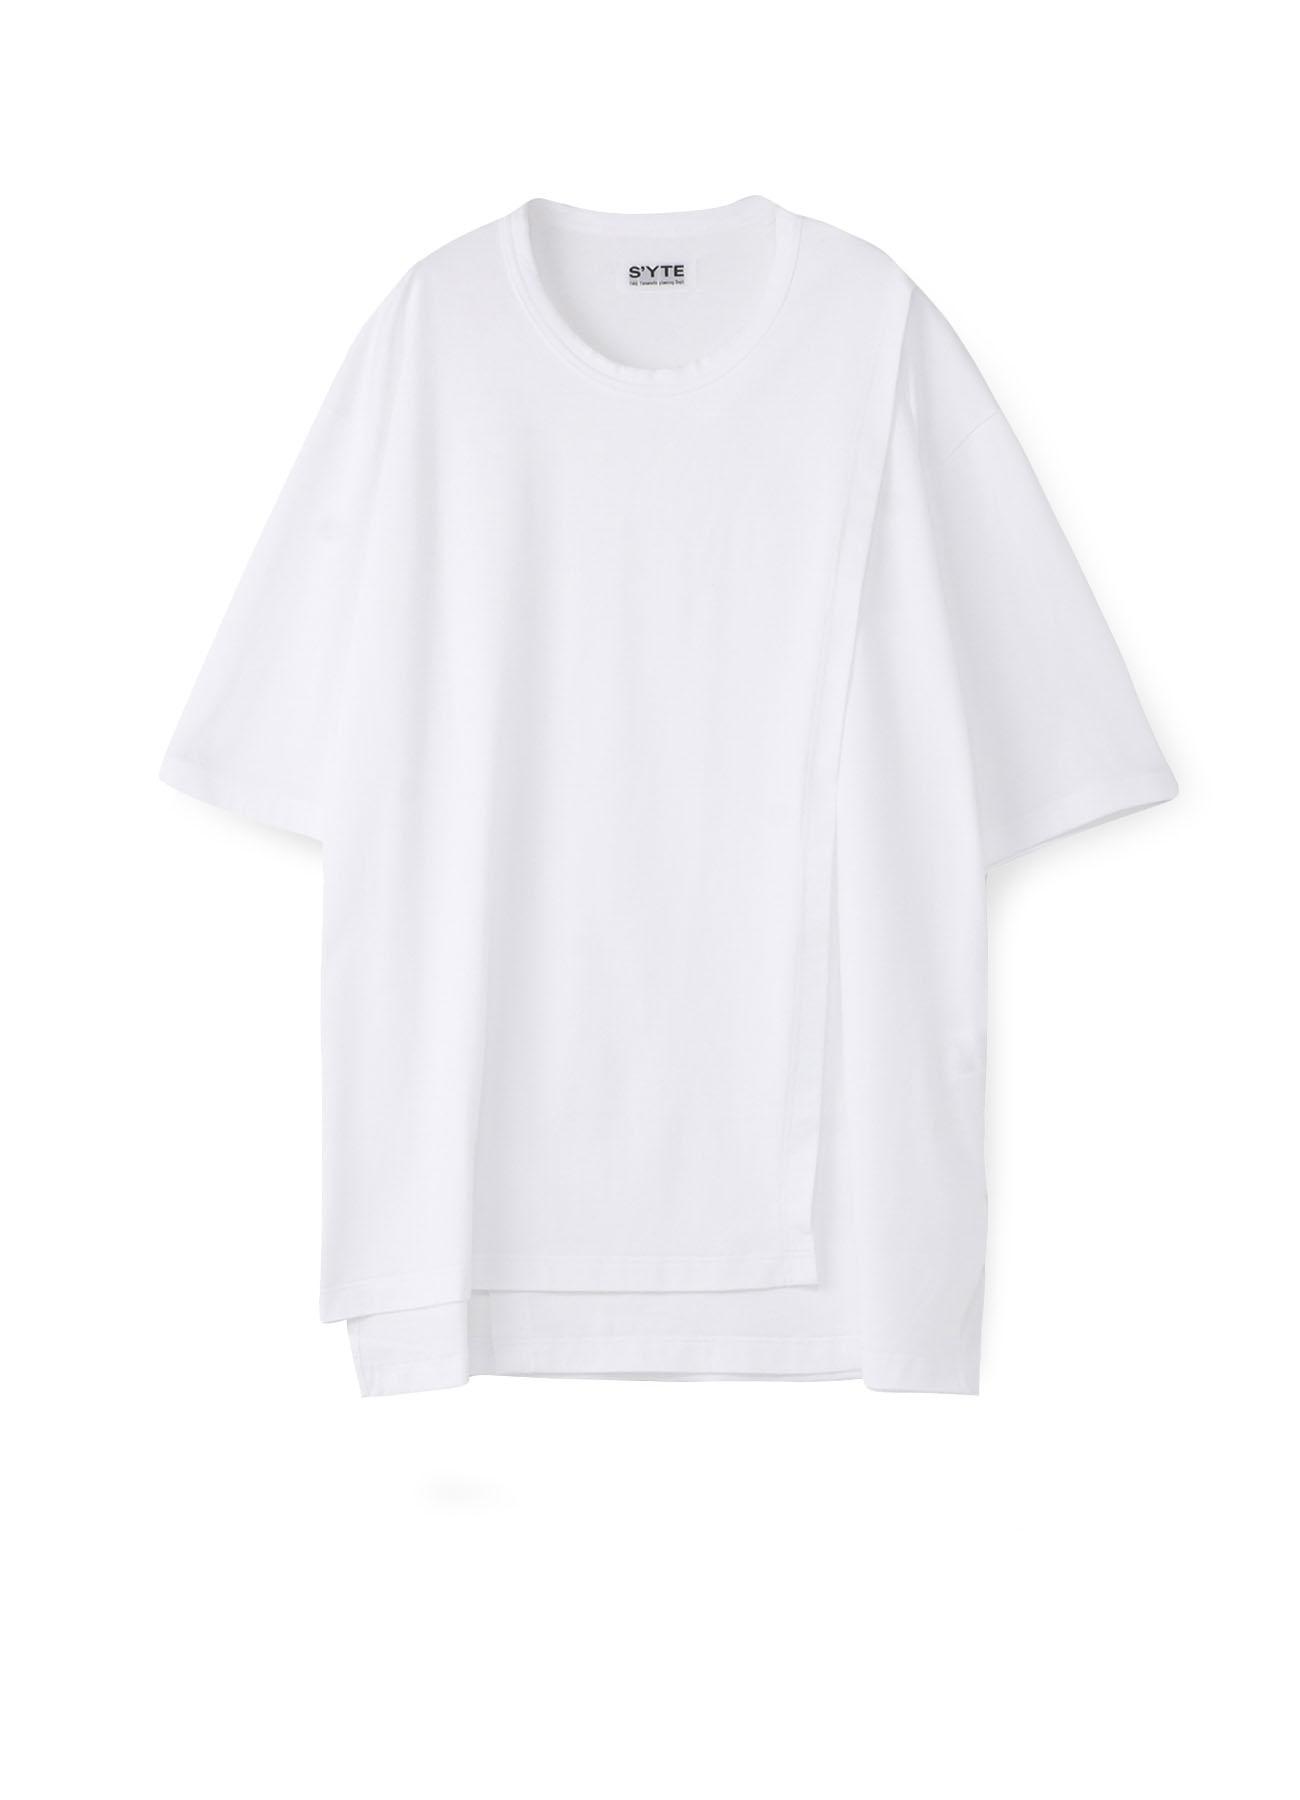 40/2Cotton Jersey Crew Neck Half-Layered T-shirt